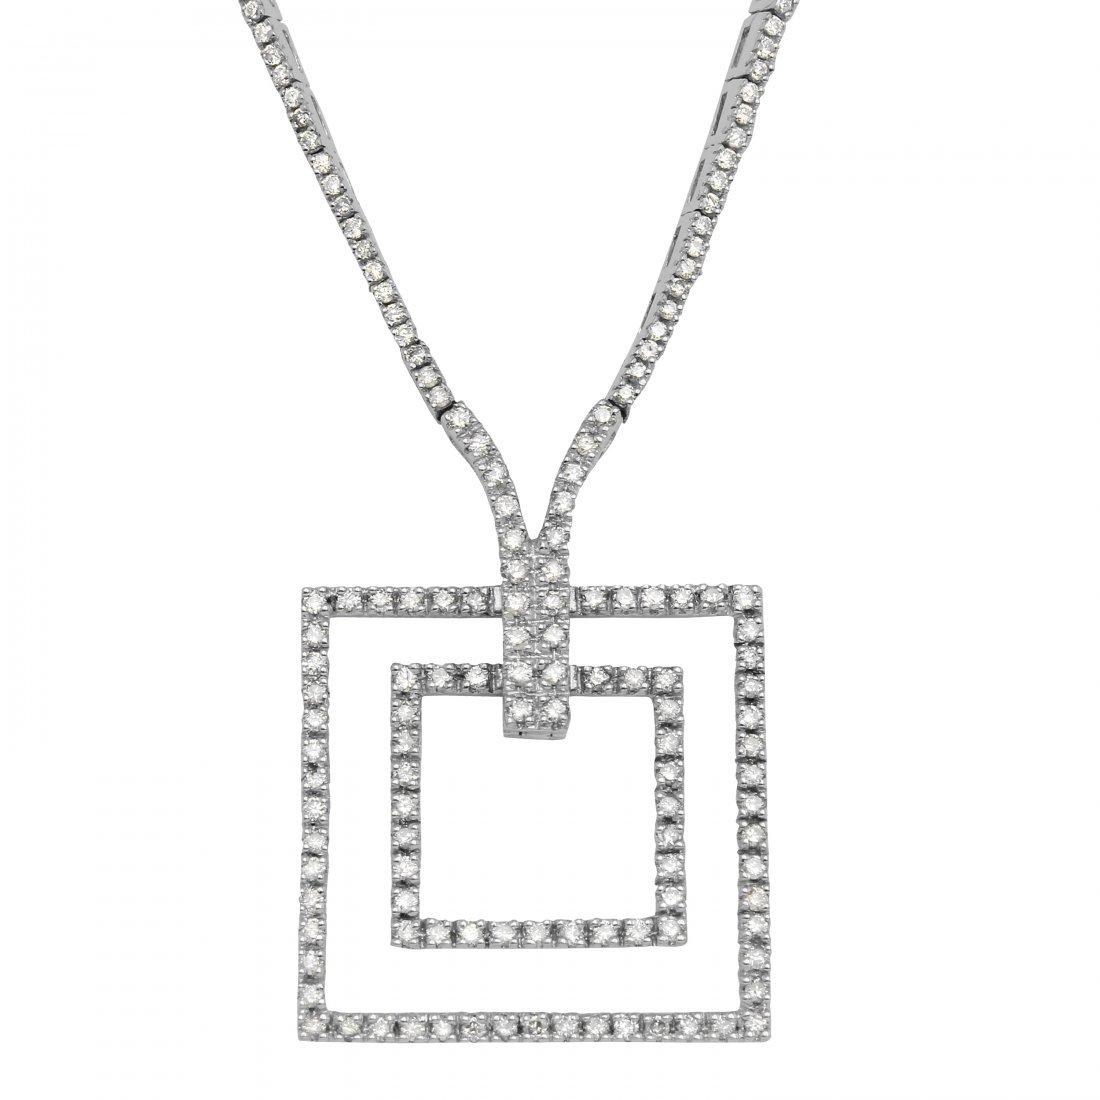 Genuine 2.25 TCW 14K White Gold Ladies Necklace